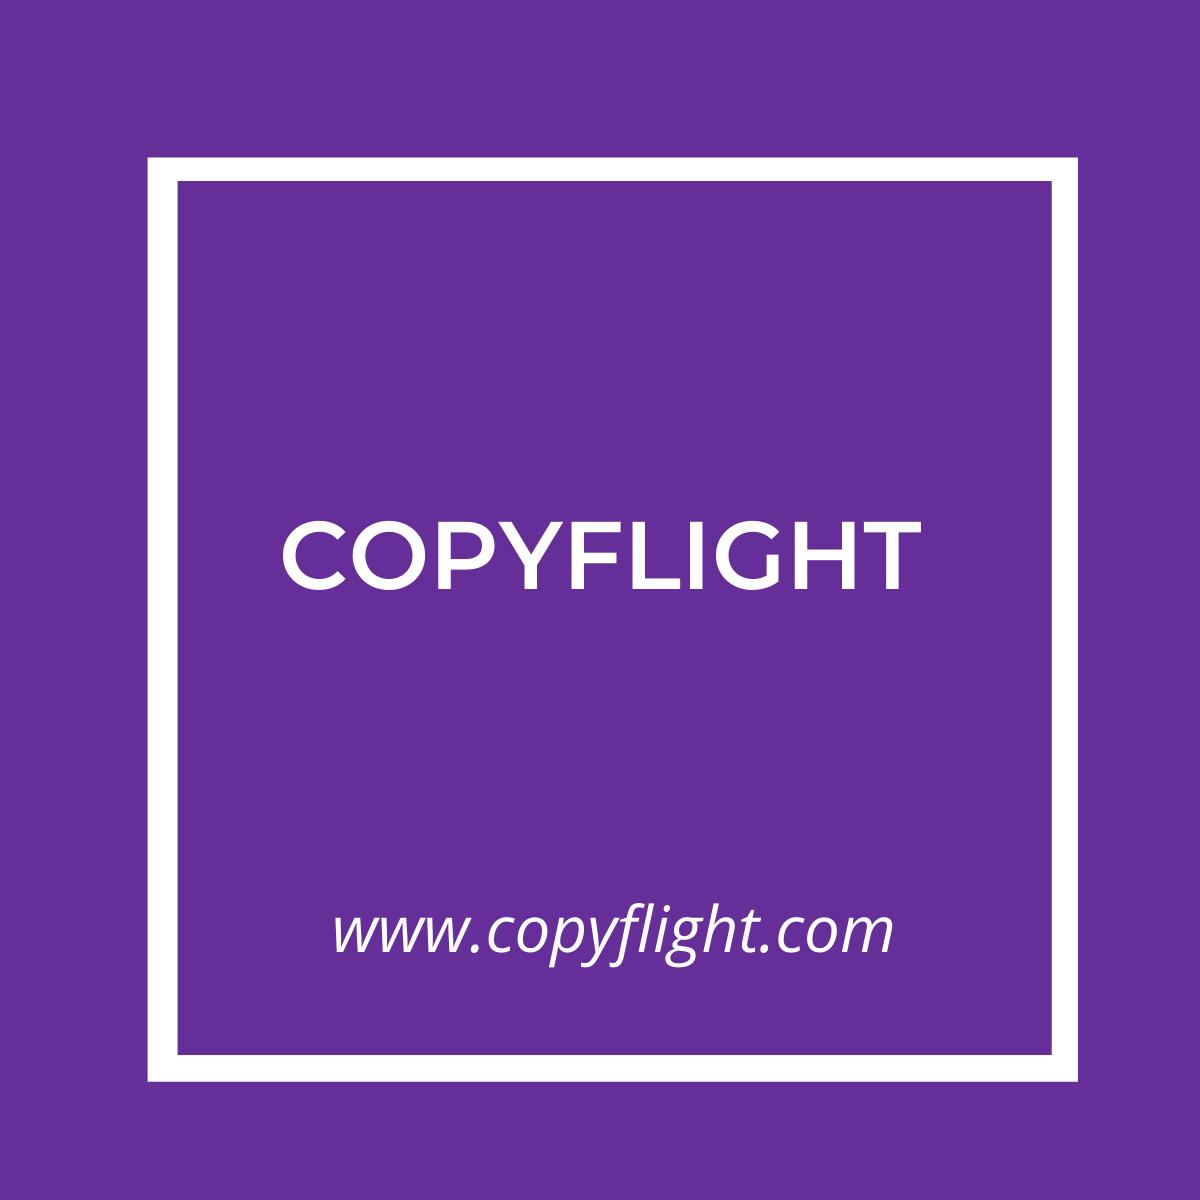 www.copyflight.com